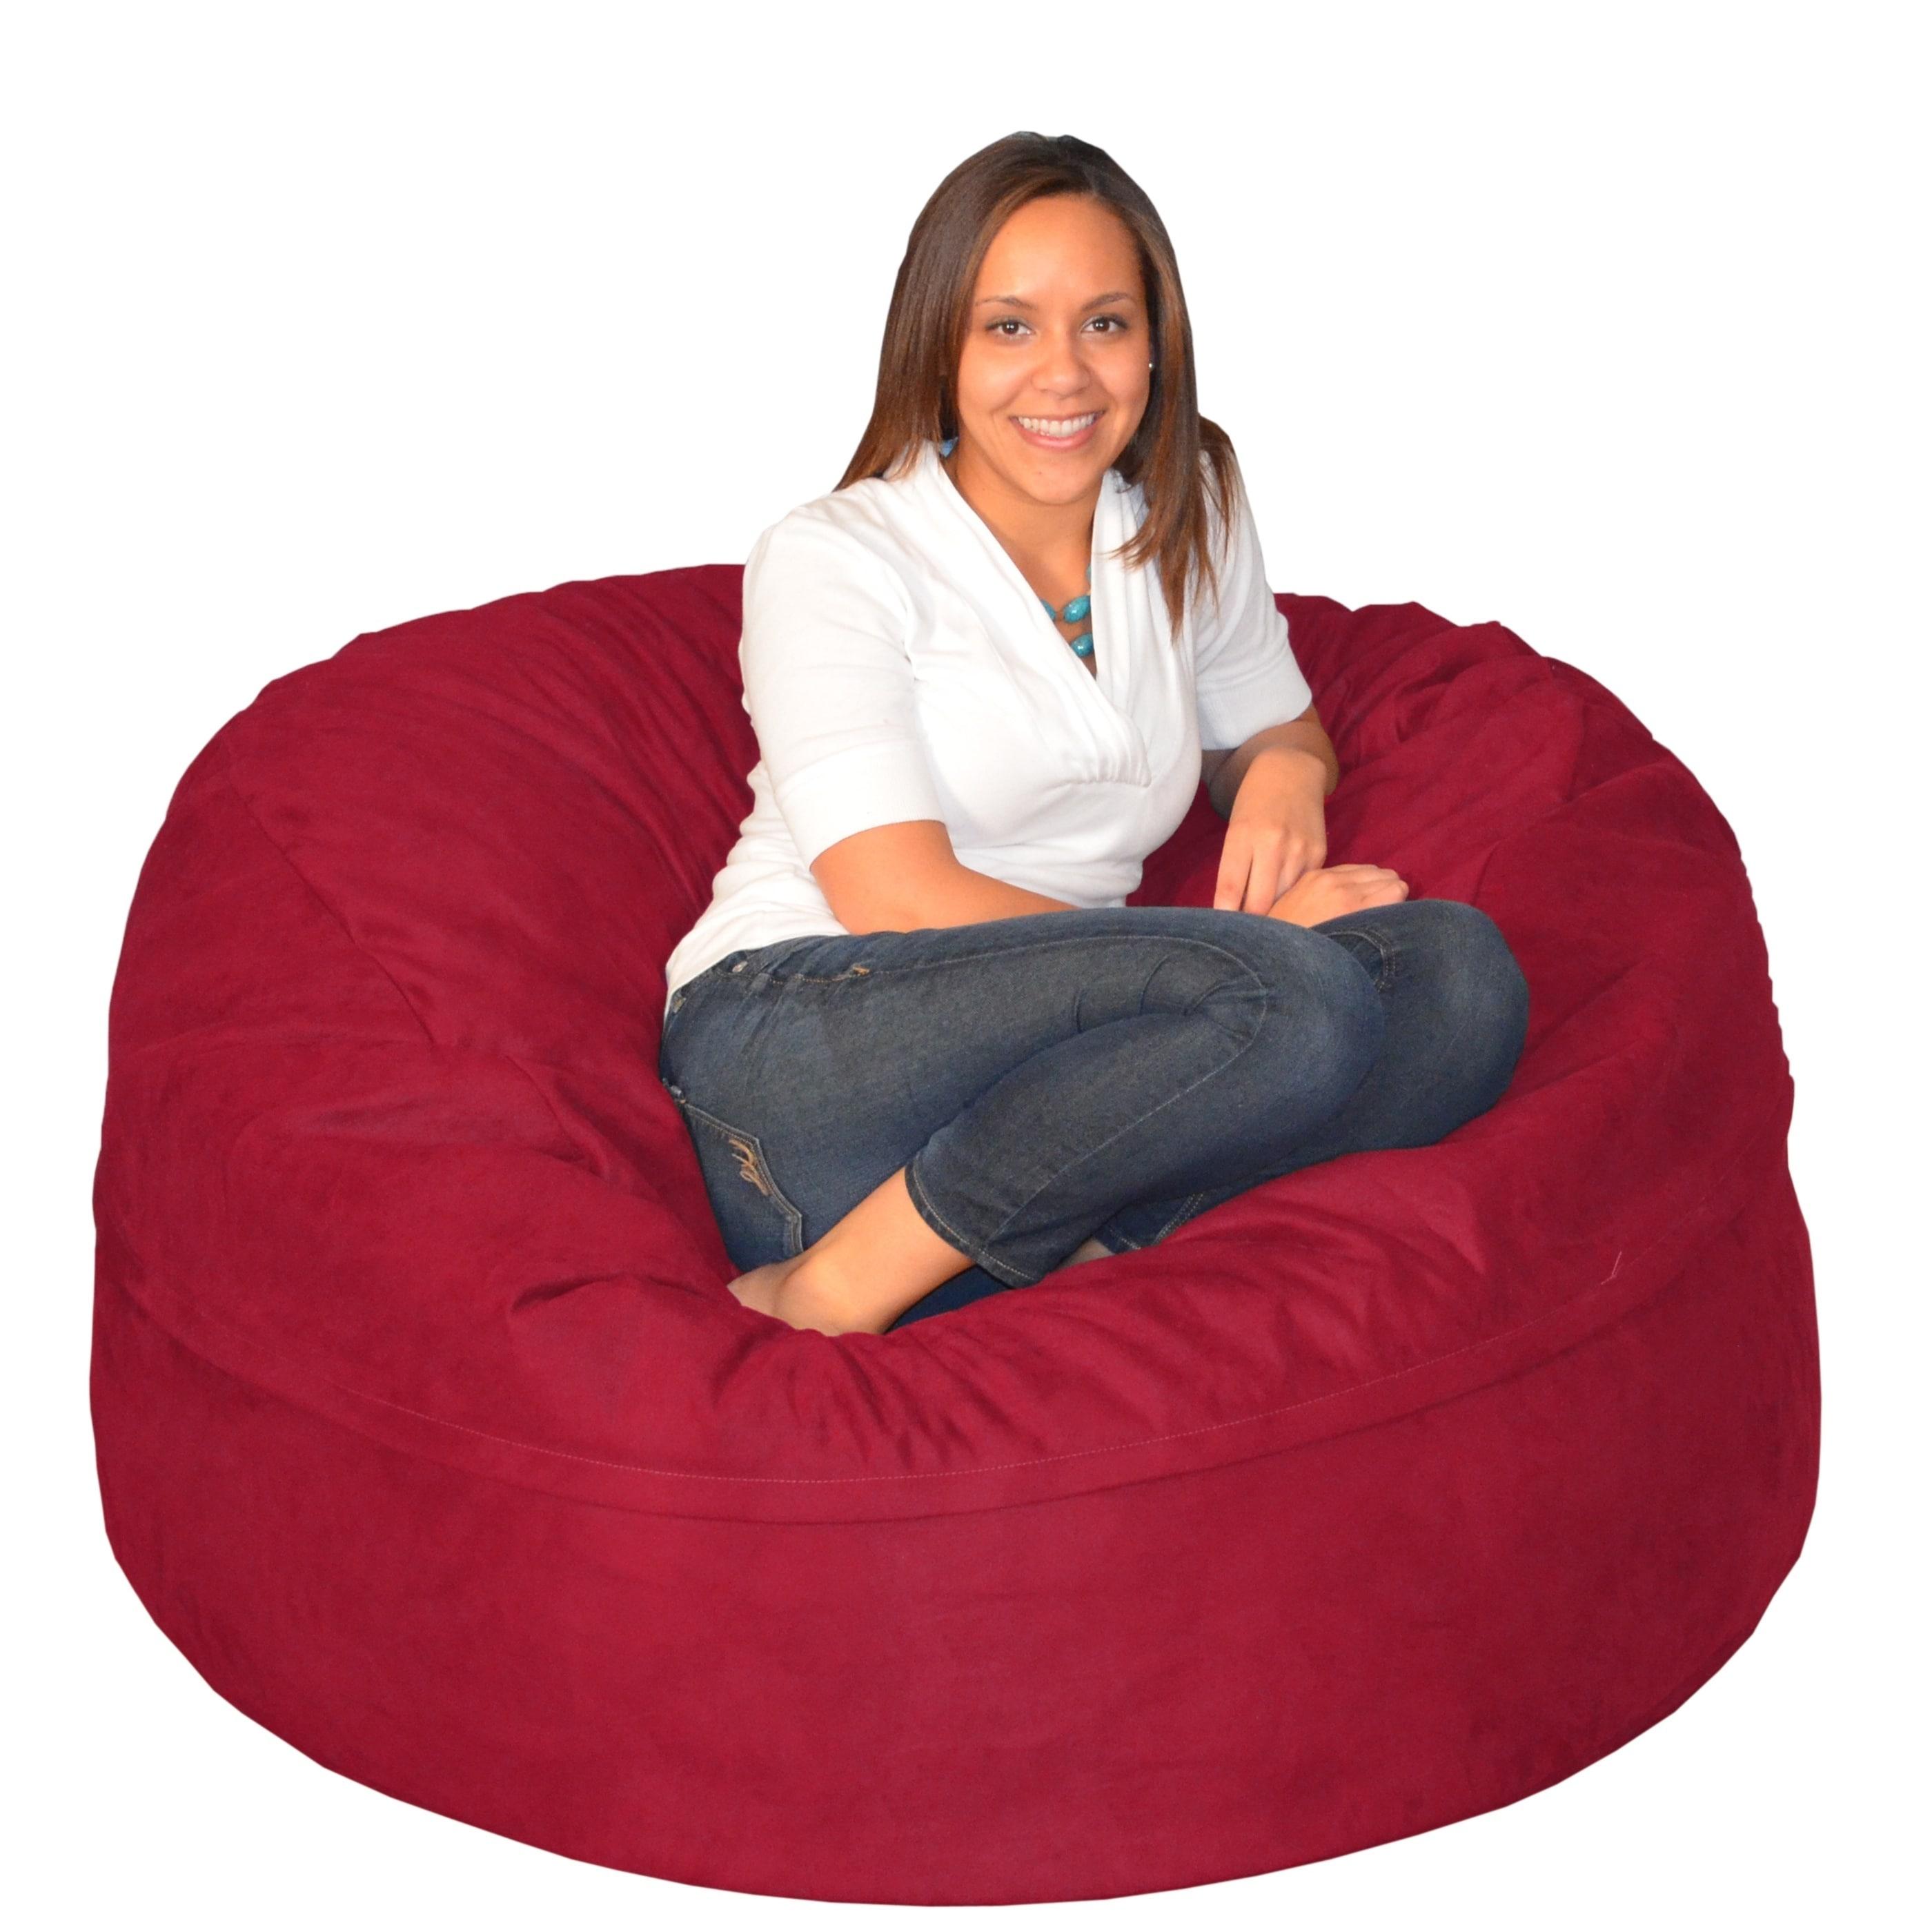 Gold Medal 6-Foot Comfort Cloud Foam Bean Bag - Free Shipping Today -  Overstock.com - 14355007